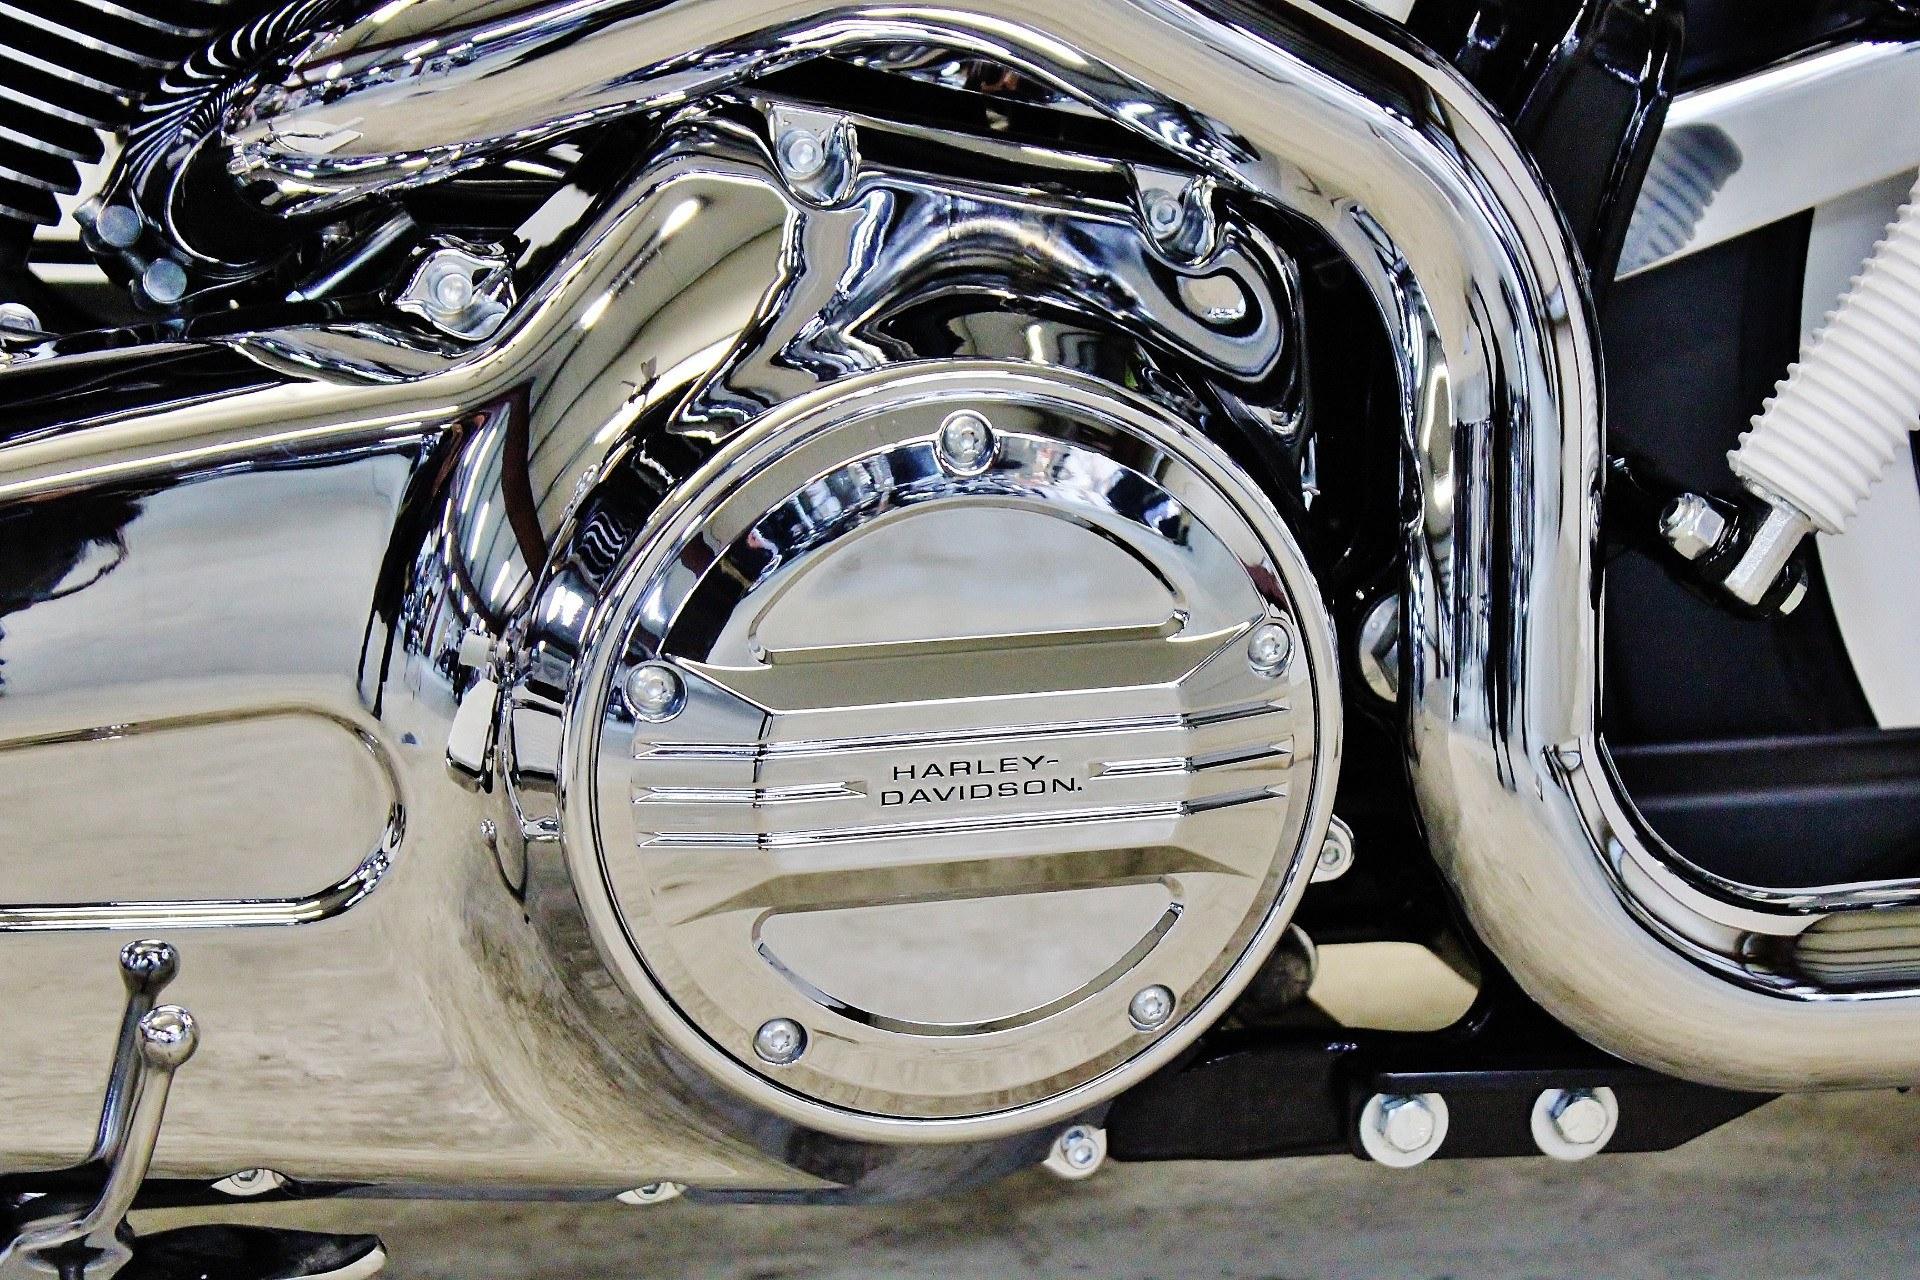 2015 Harley-Davidson Softail® Deluxe in Pittsfield, Massachusetts